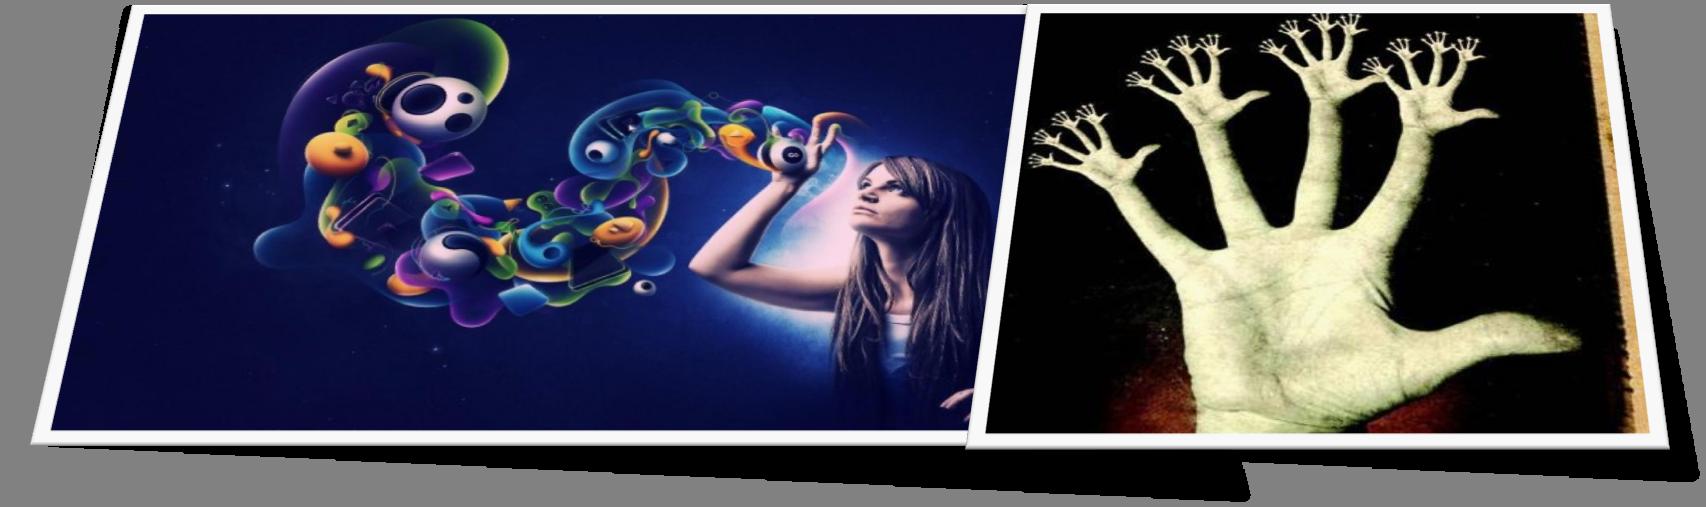 Anclaje-Emocional-Cerebro-Marité-Rodríguez